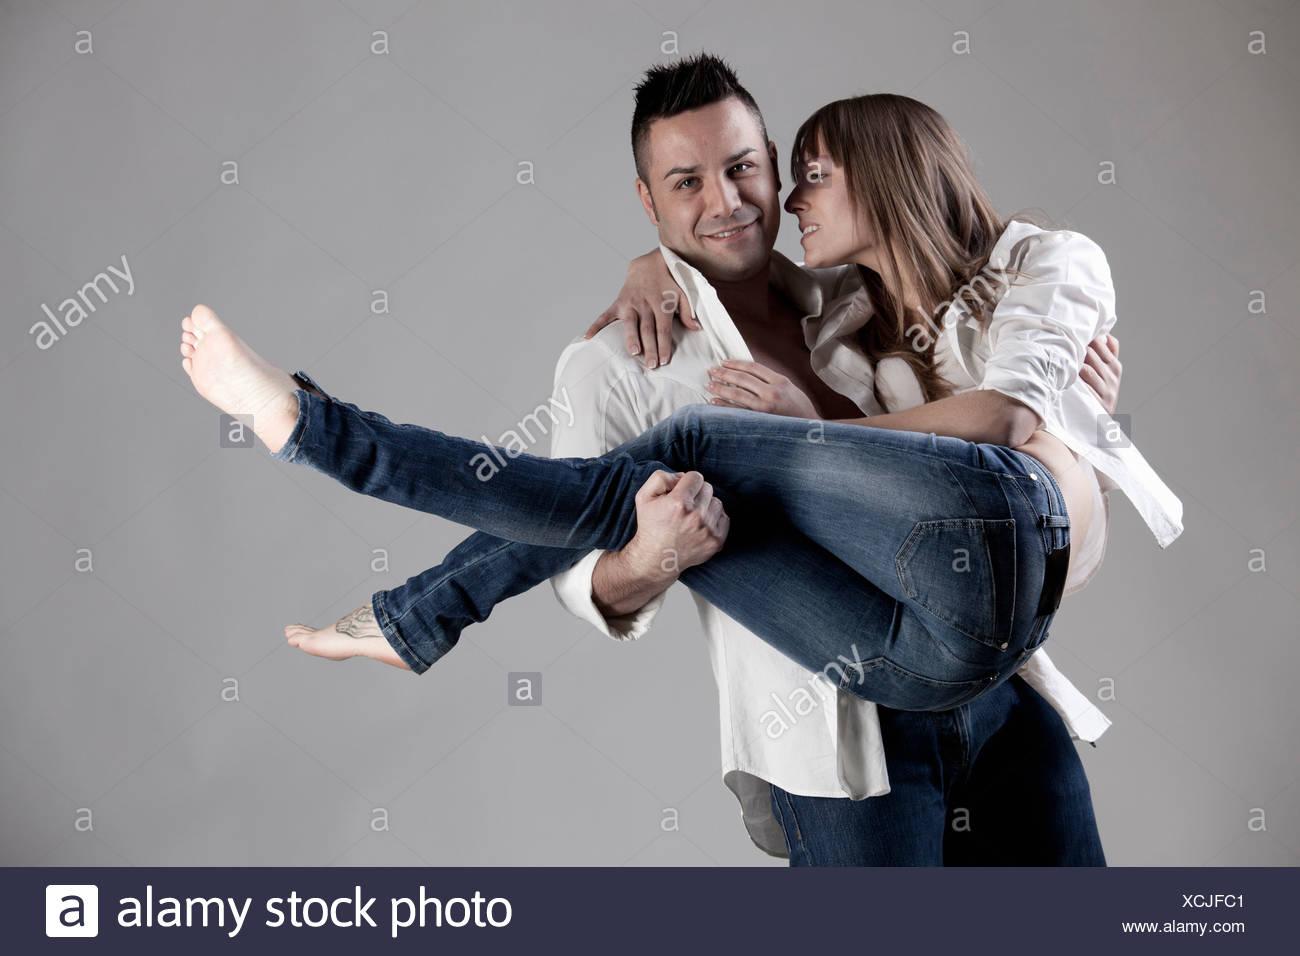 Smiling man carrying girlfriend - Stock Image